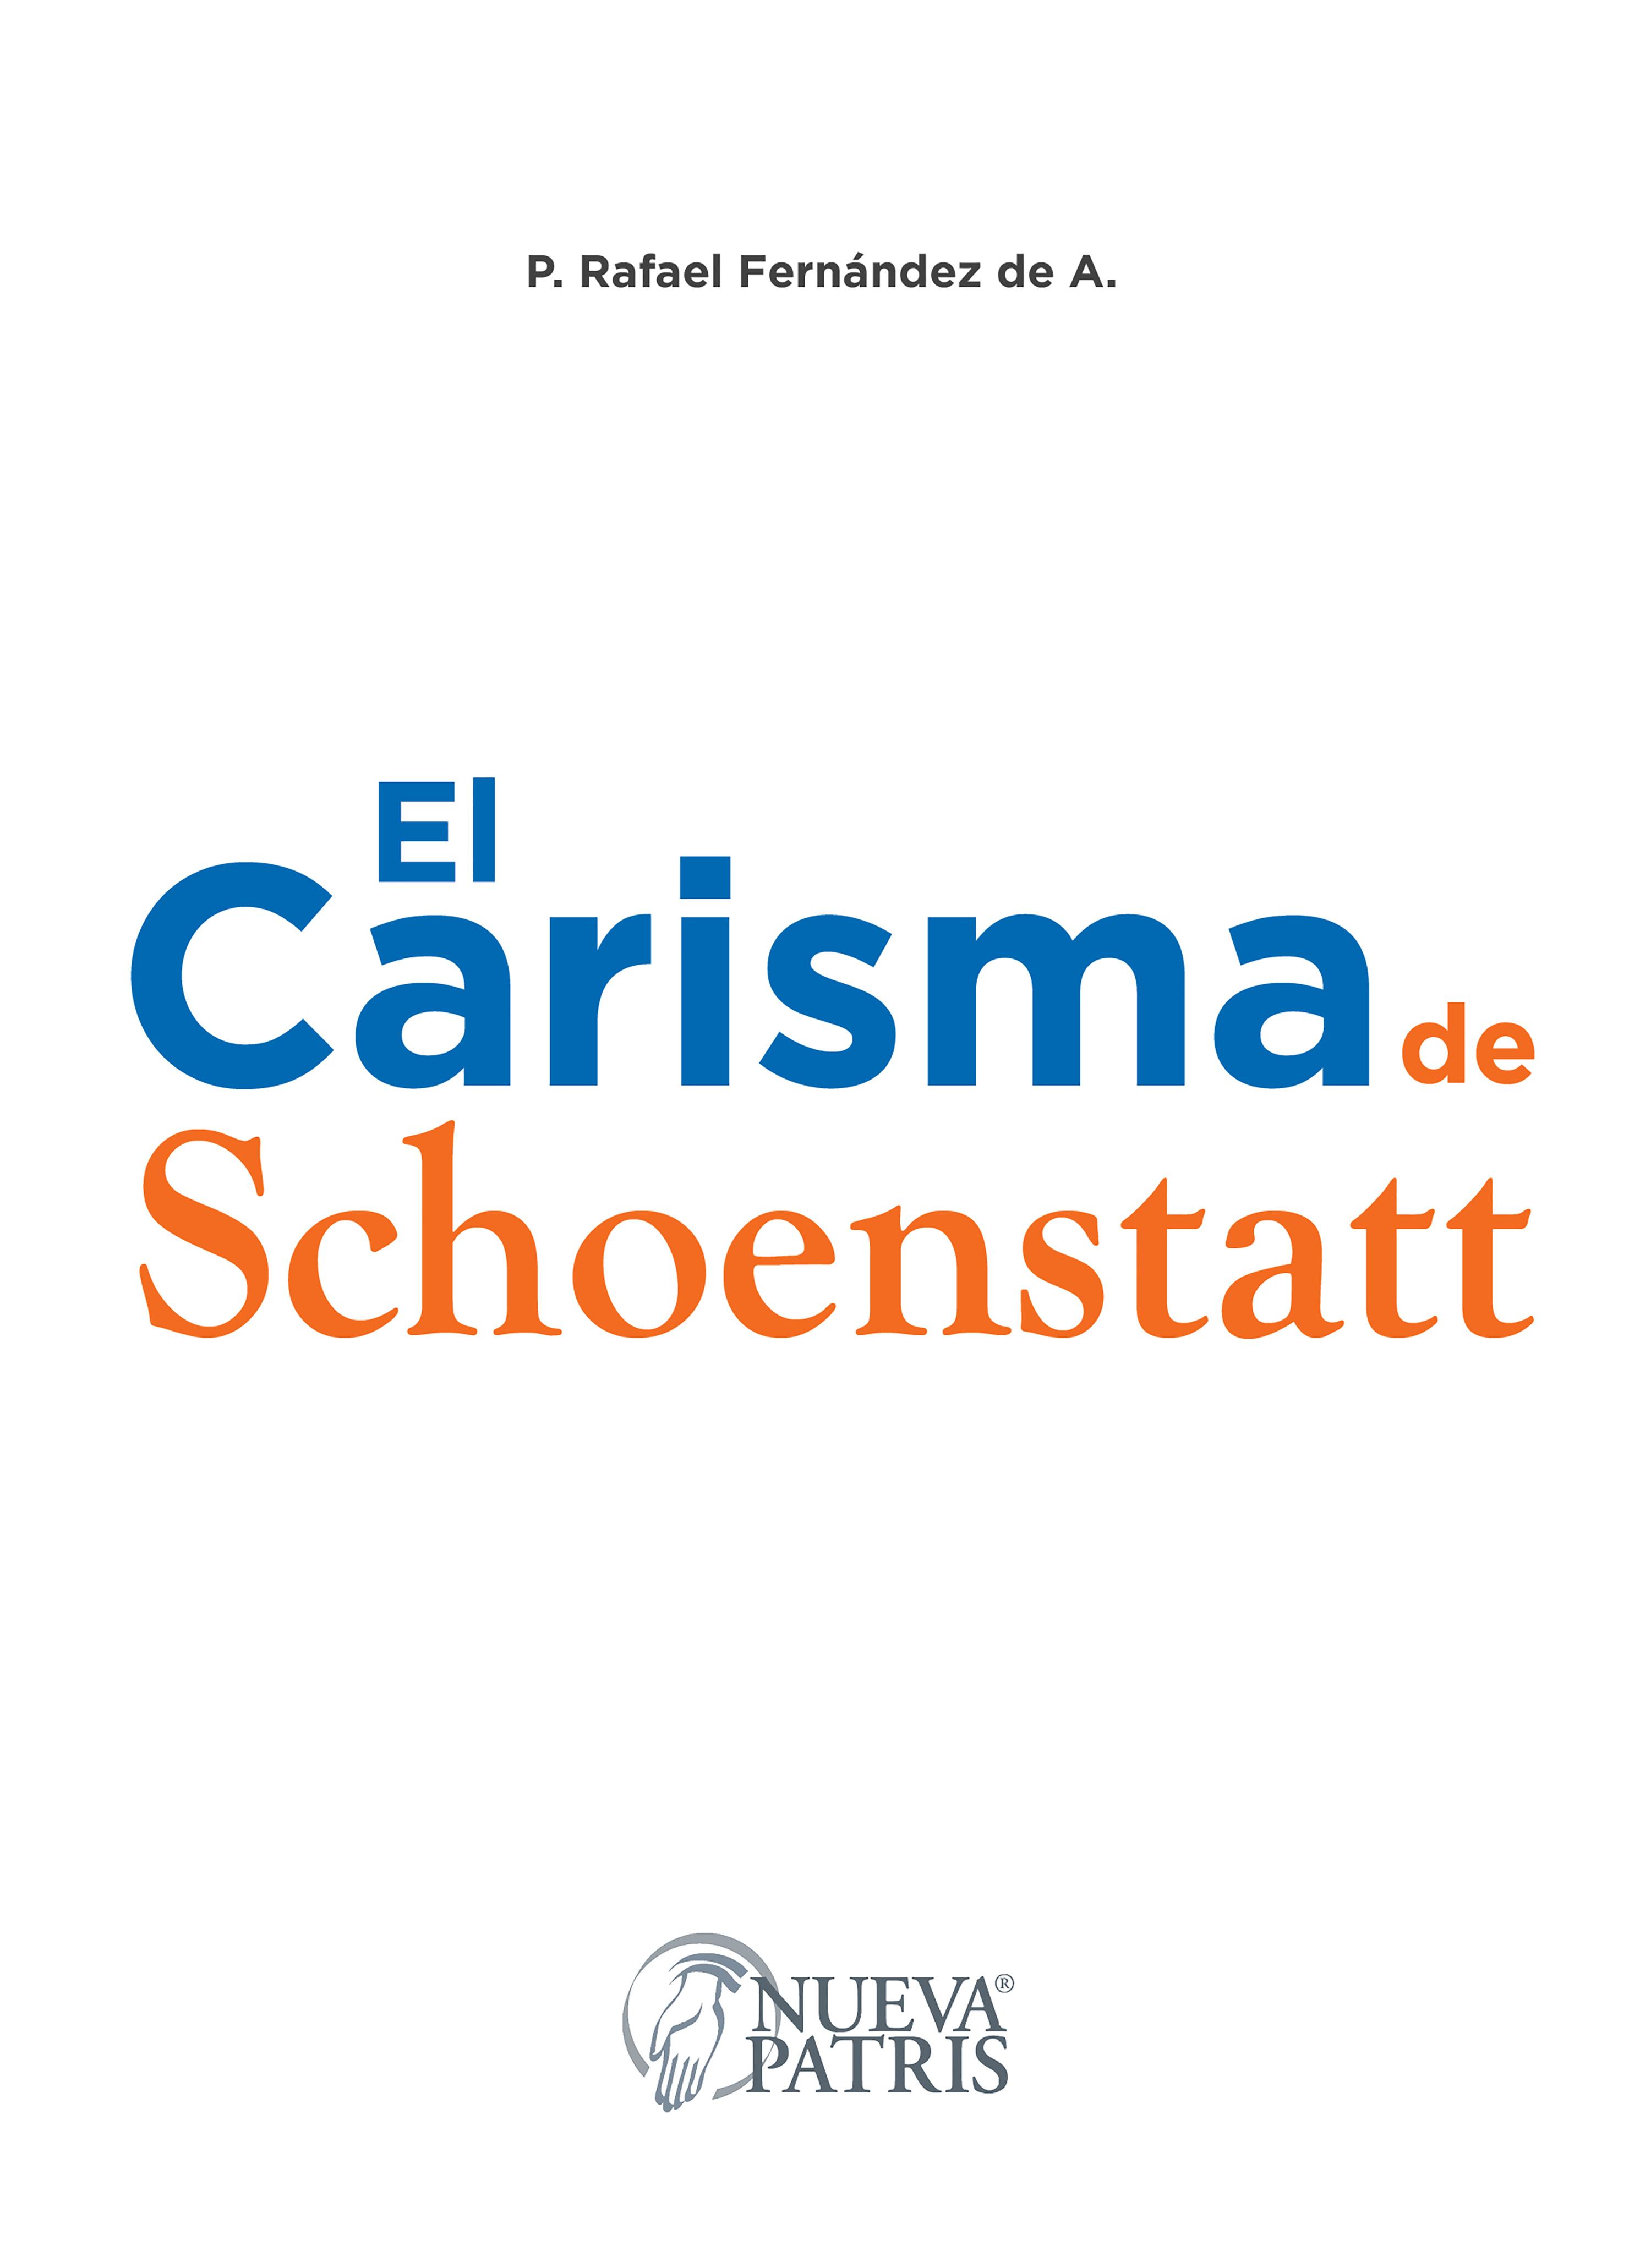 El Carisma de Schoenstatt